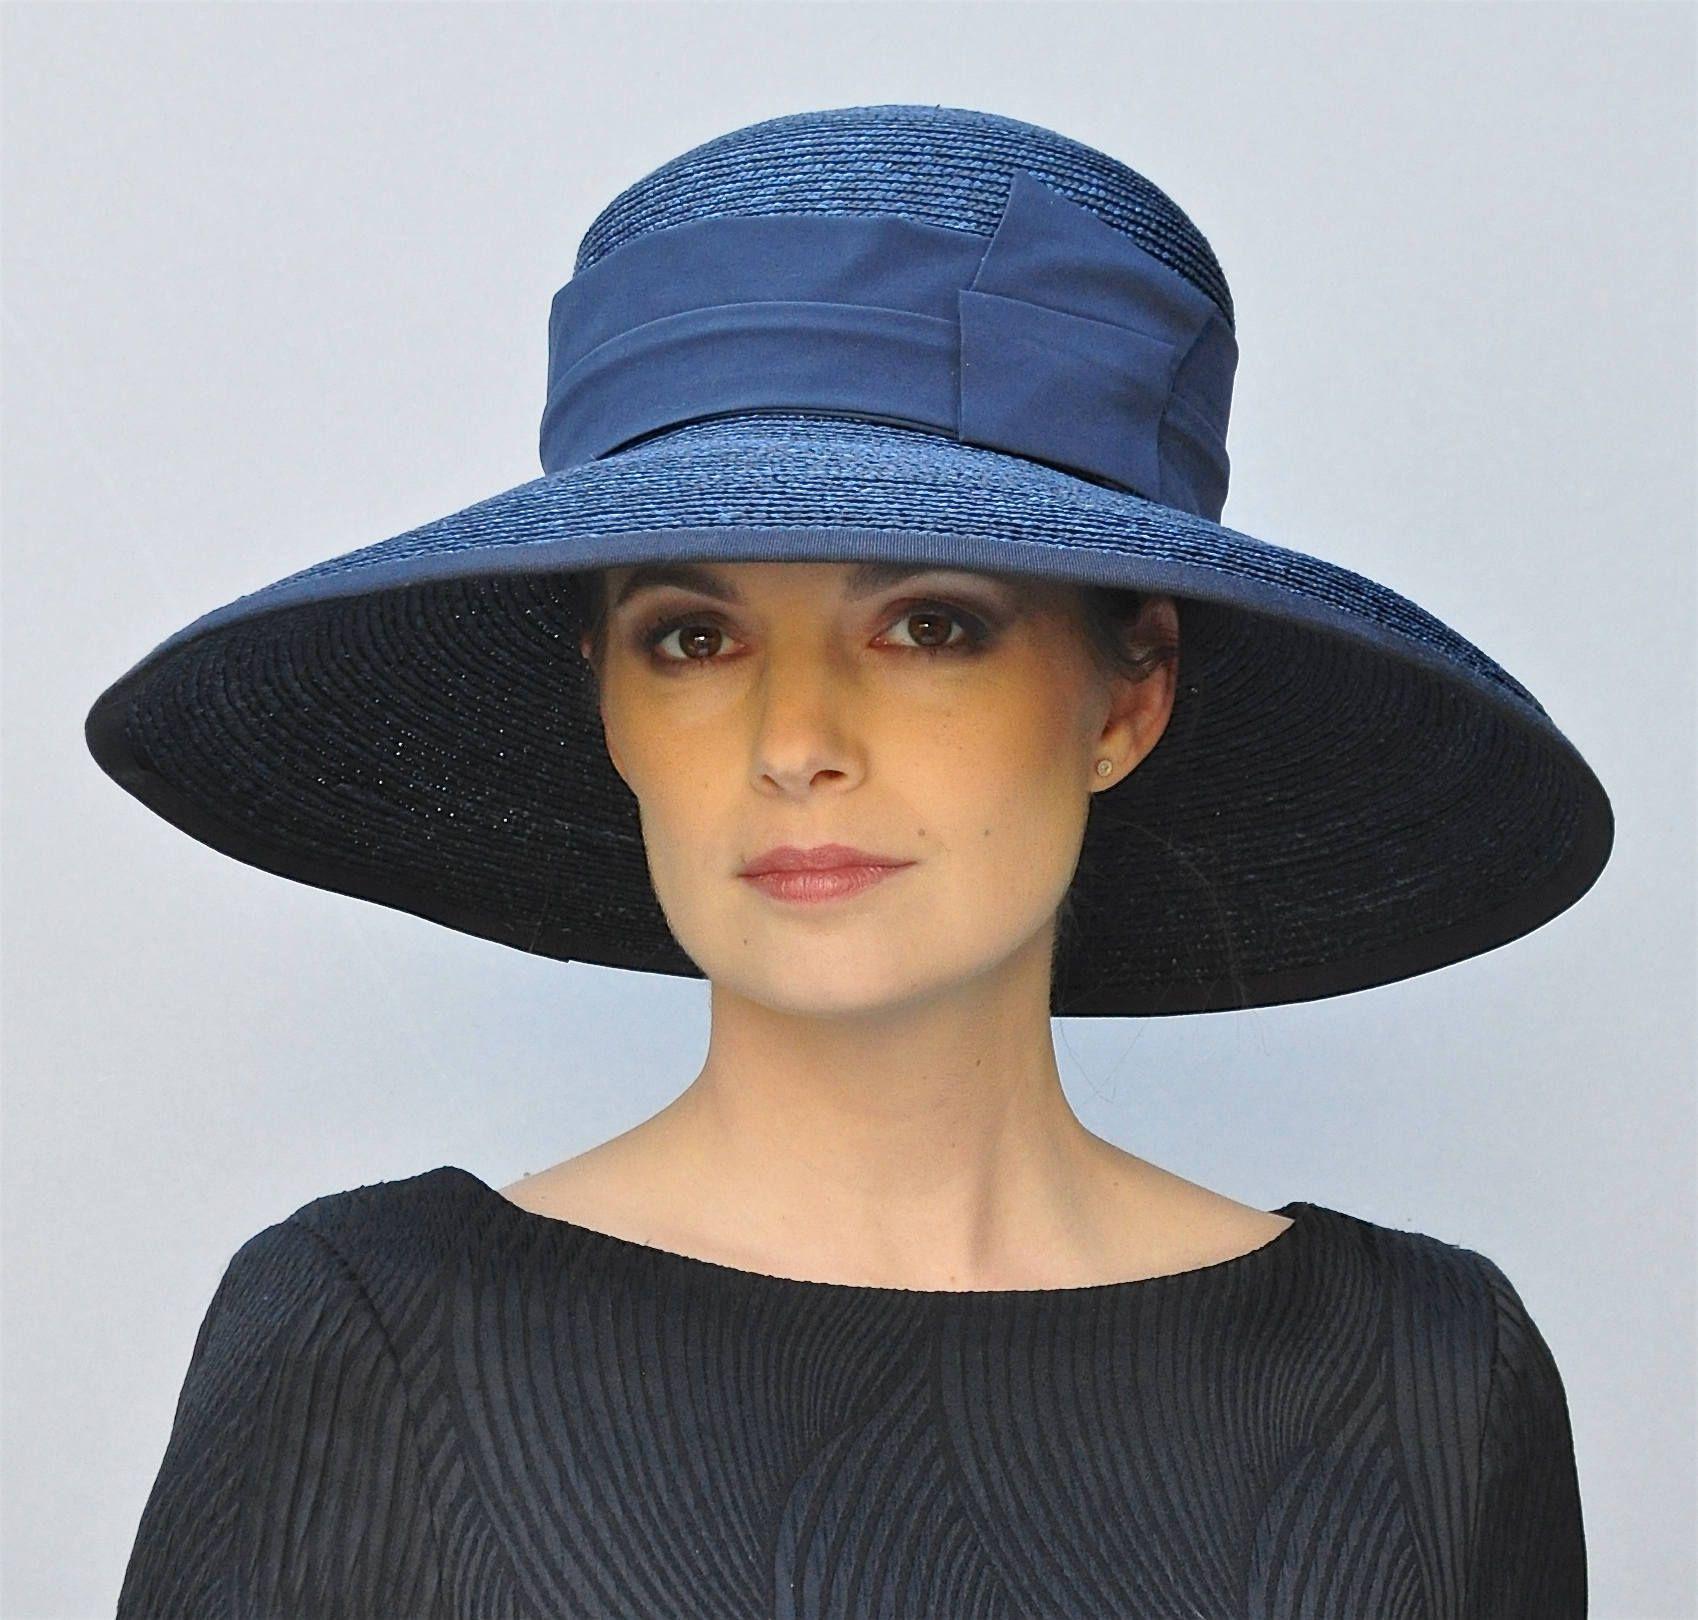 4d2e6a309d908 Wide Brim Navy Blue Hat, Wedding Hat, Church Hat, Audrey Hepburn Hat, Derby  Hat Women's Navy formal hat Ascot Hat, Occasion Event Hat Dressy